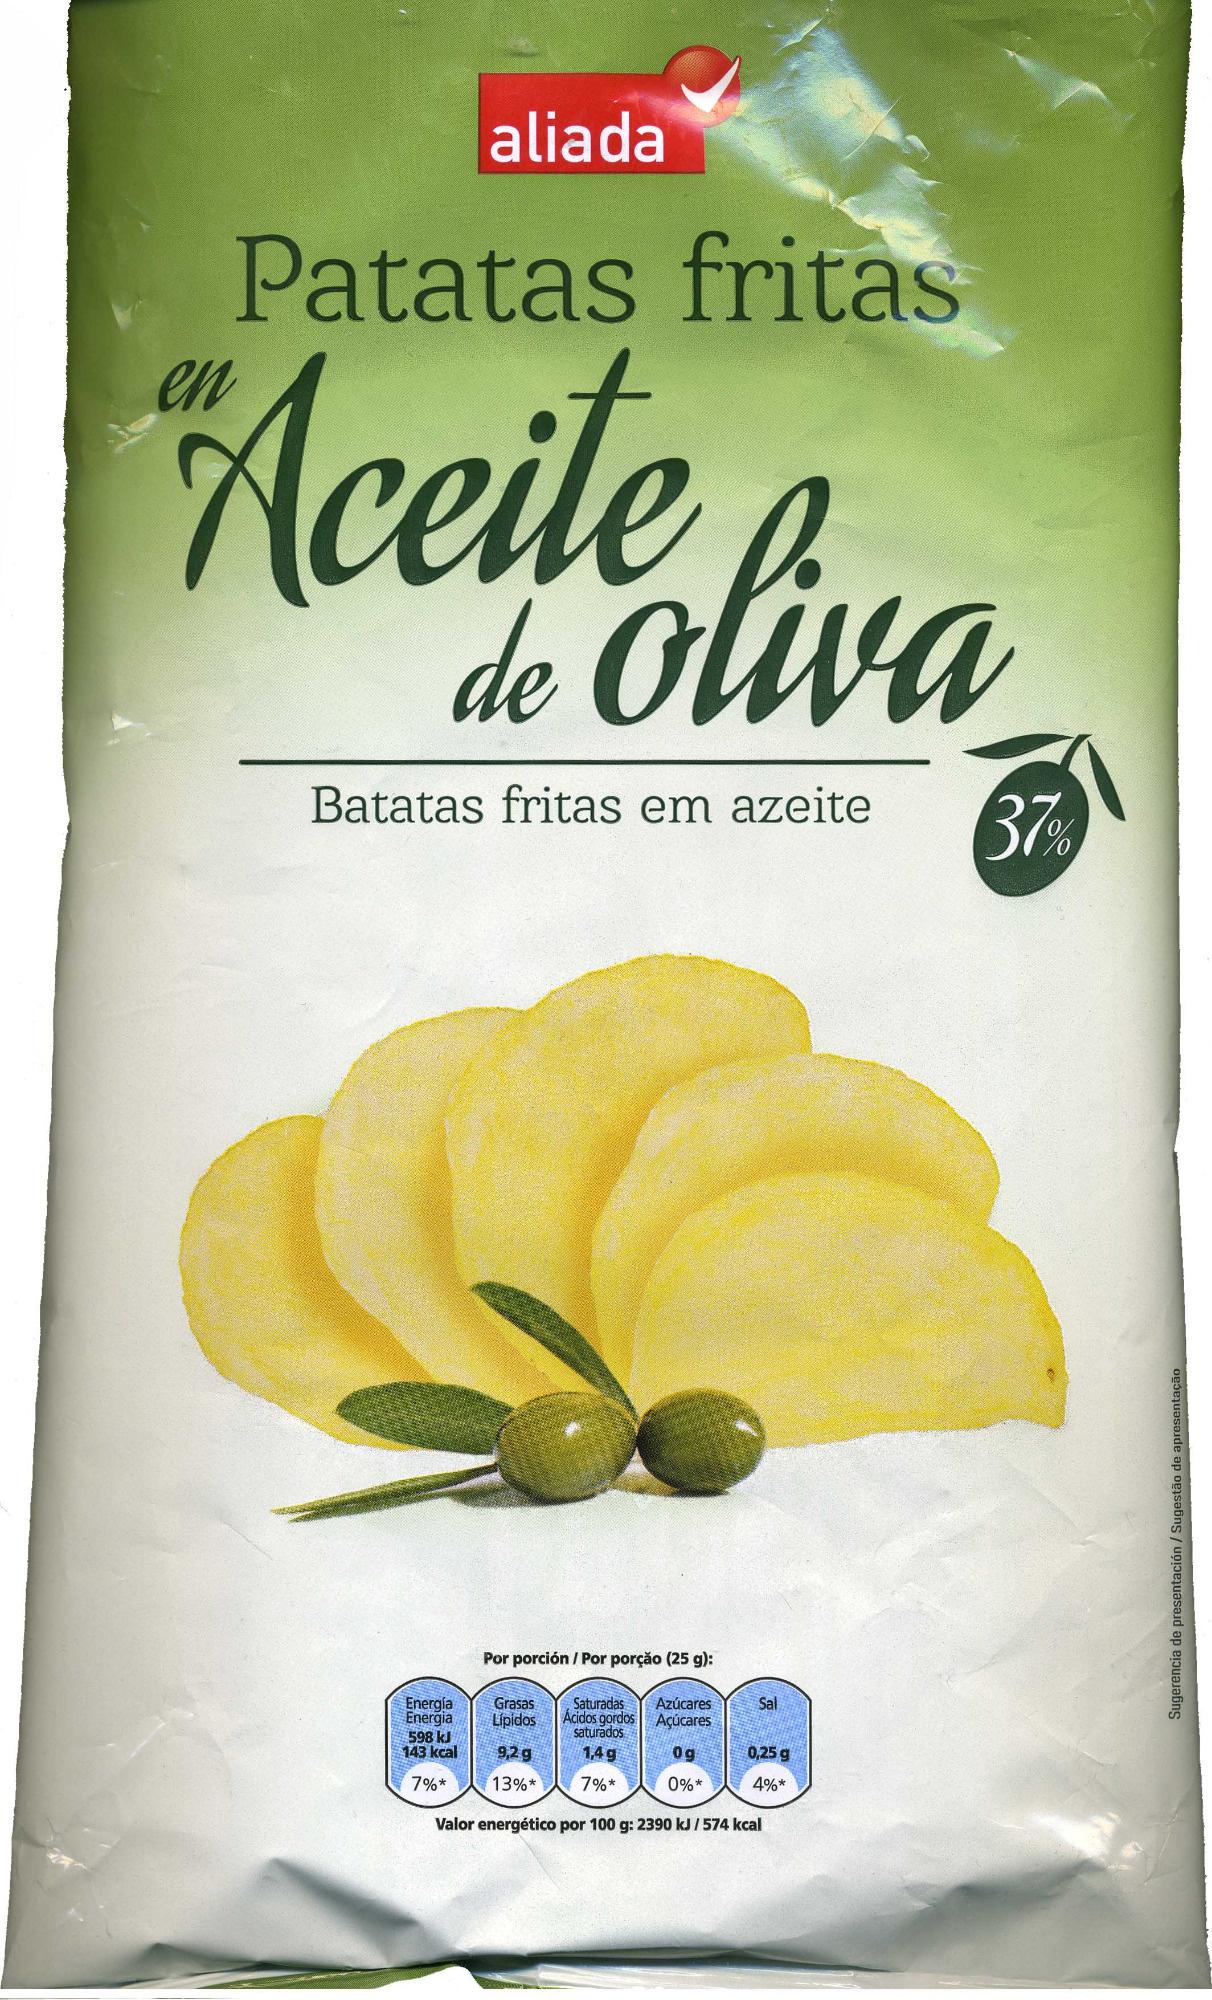 Patatas fritas lisas en aceite de oliva - Produit - es